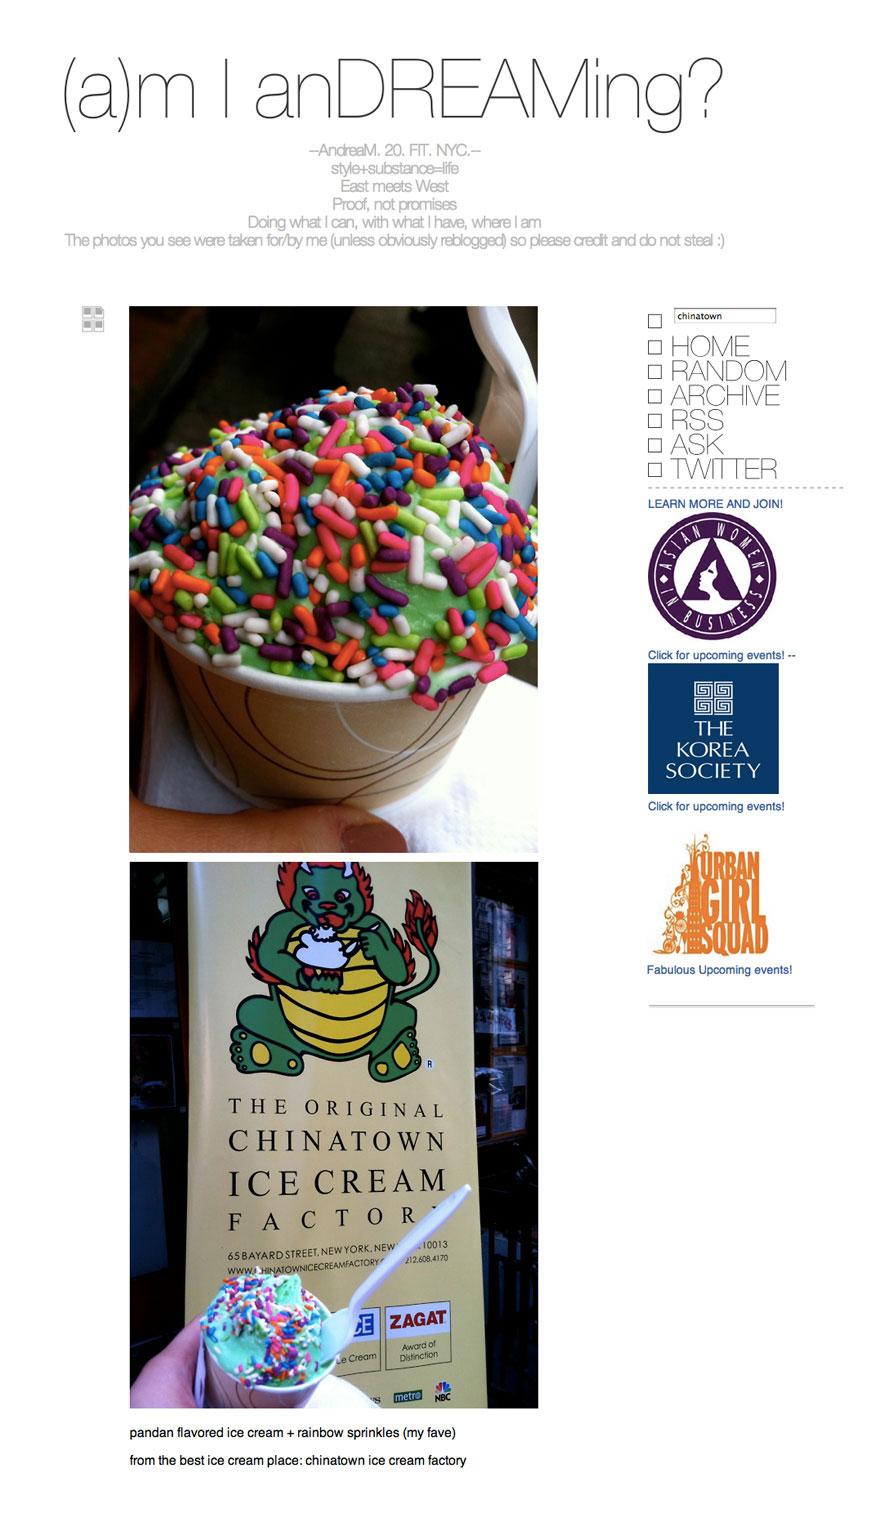 press_2012-02-19_am_i_andreaming.jpg